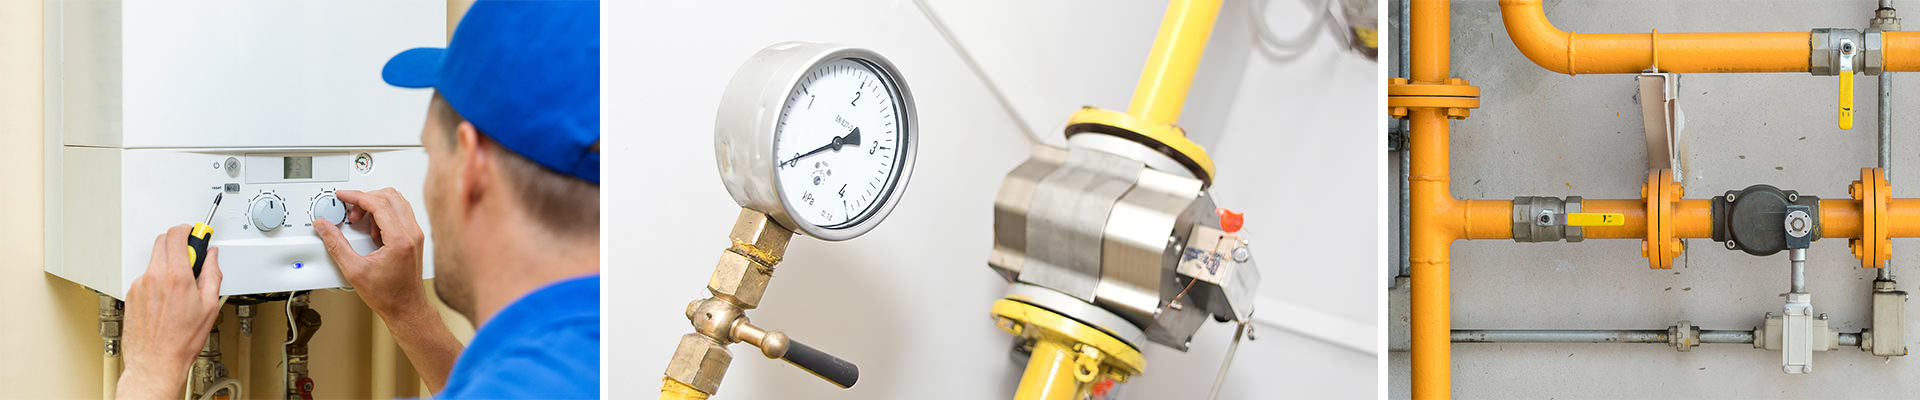 installation gaz ,installation intérieure de gaz, gaz naturel